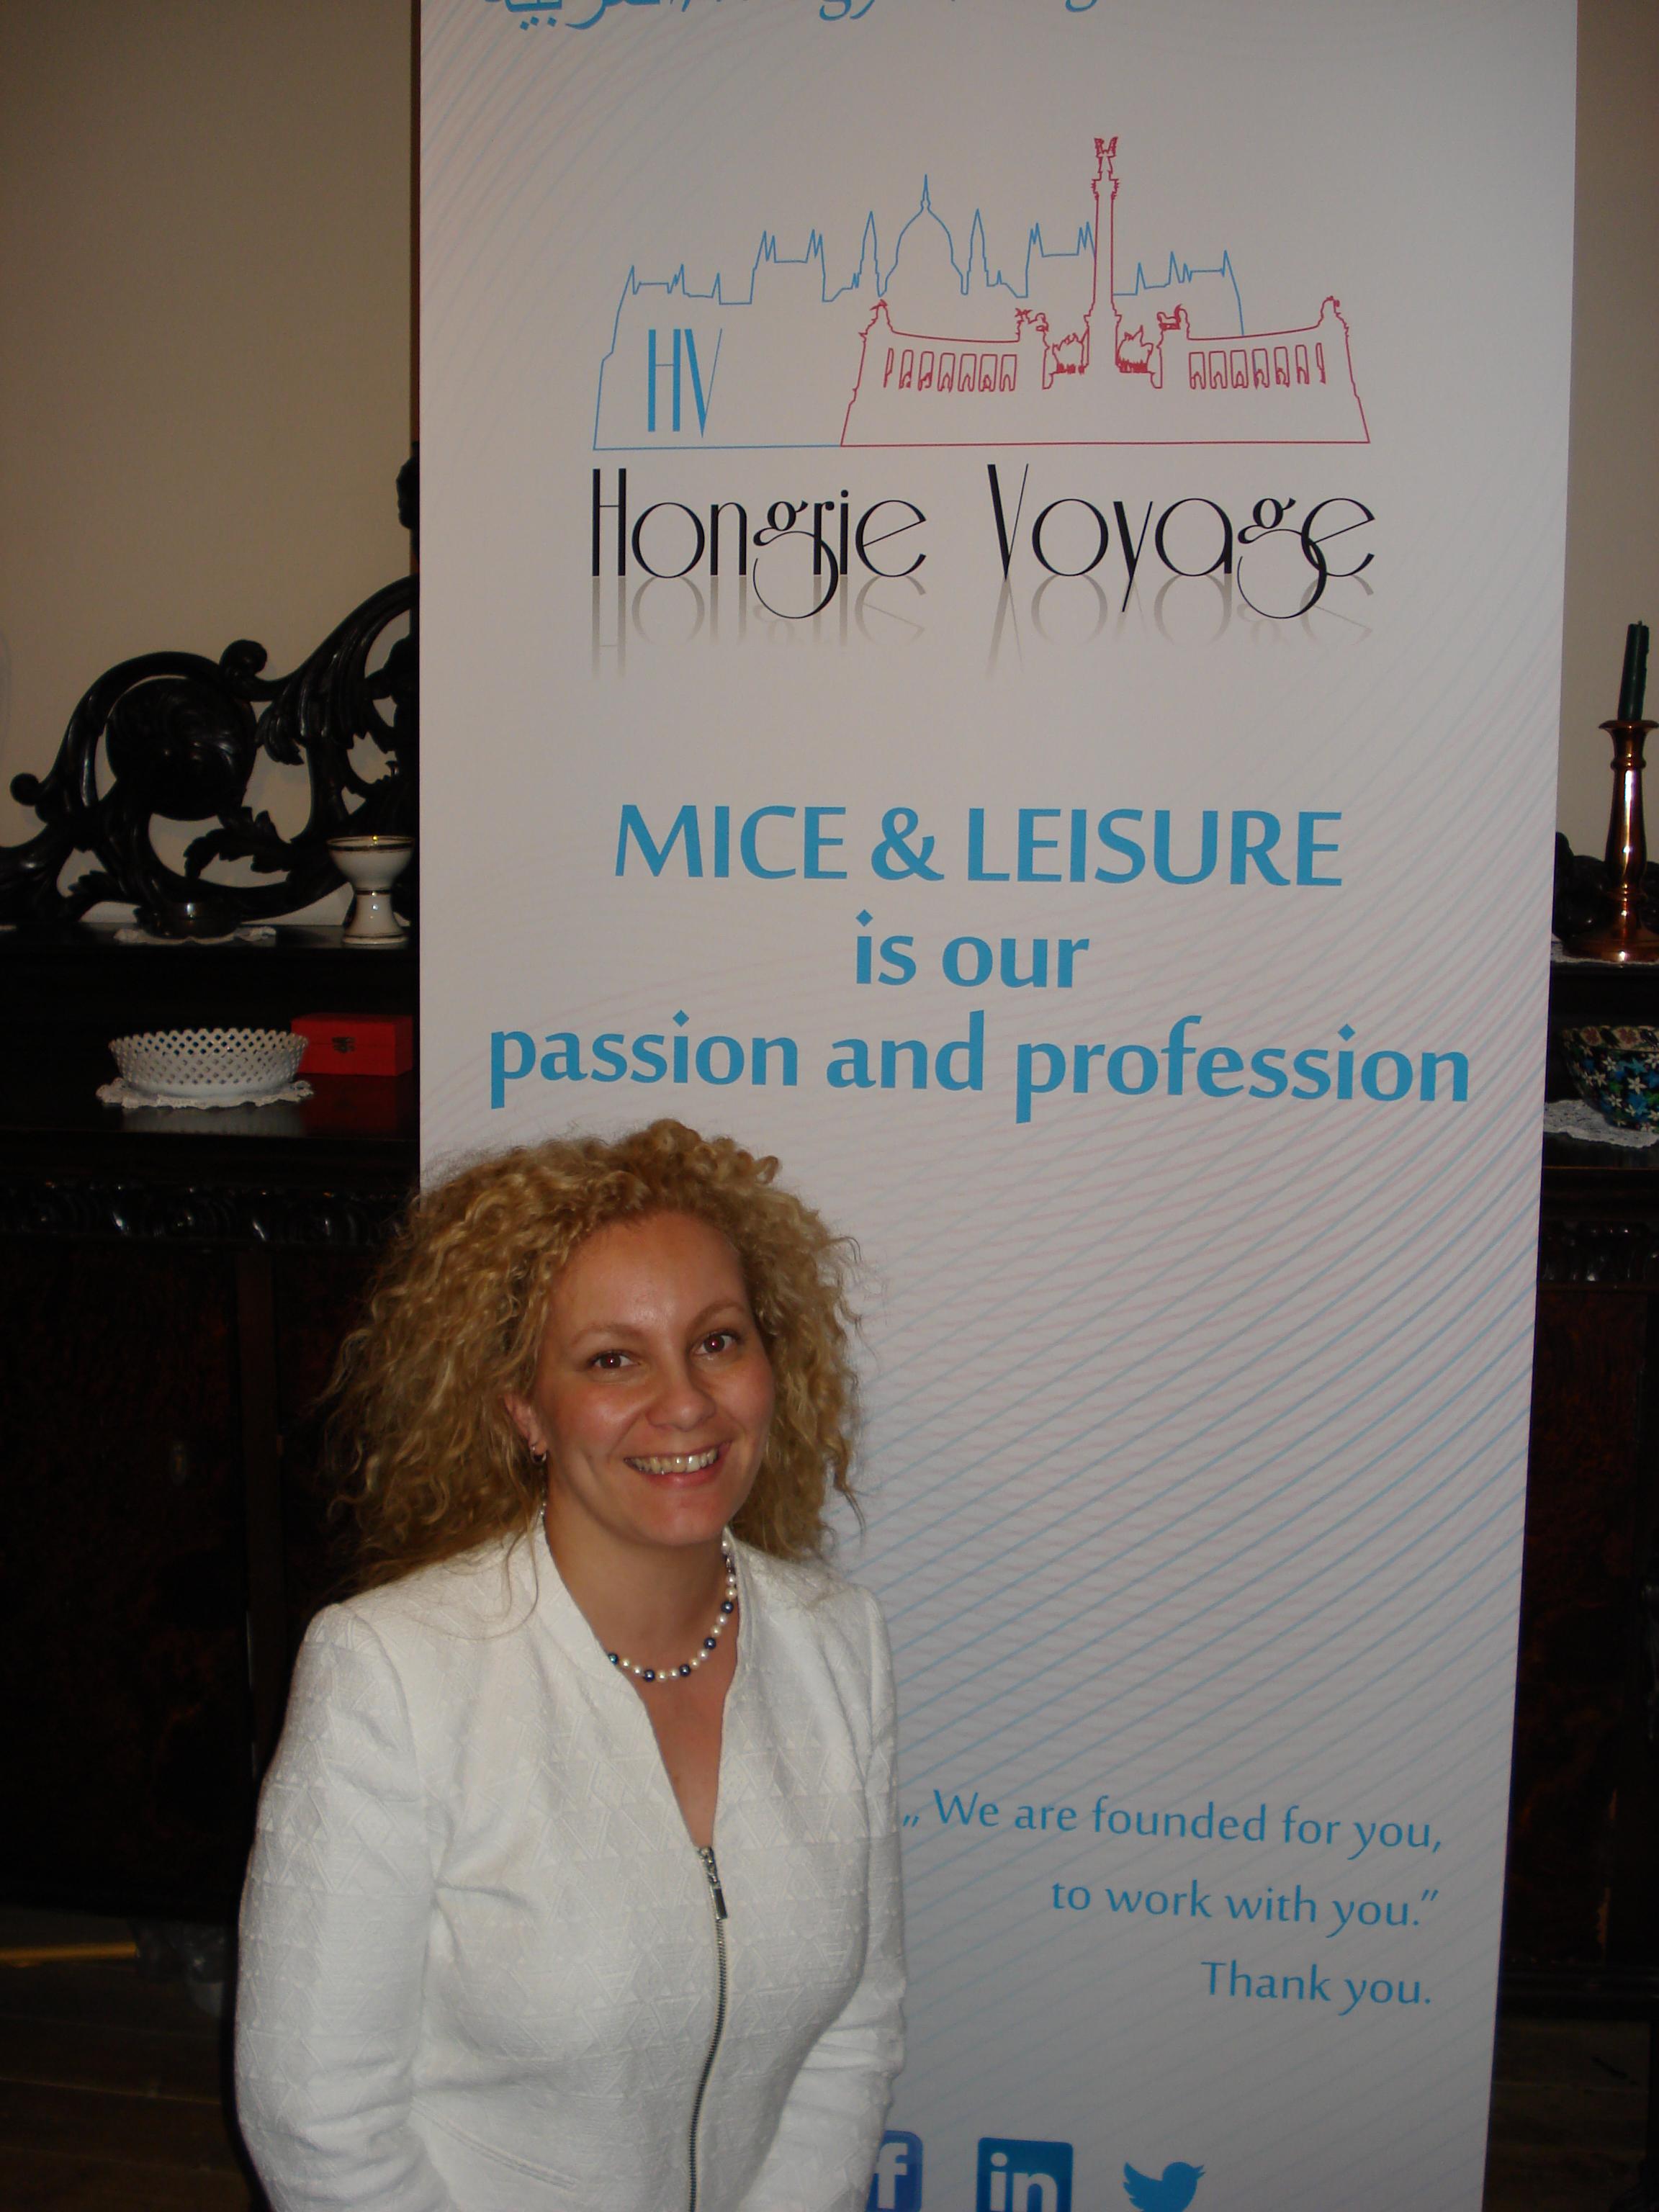 Lilia Chadi, Owner, General Manager Hongrie Voyage